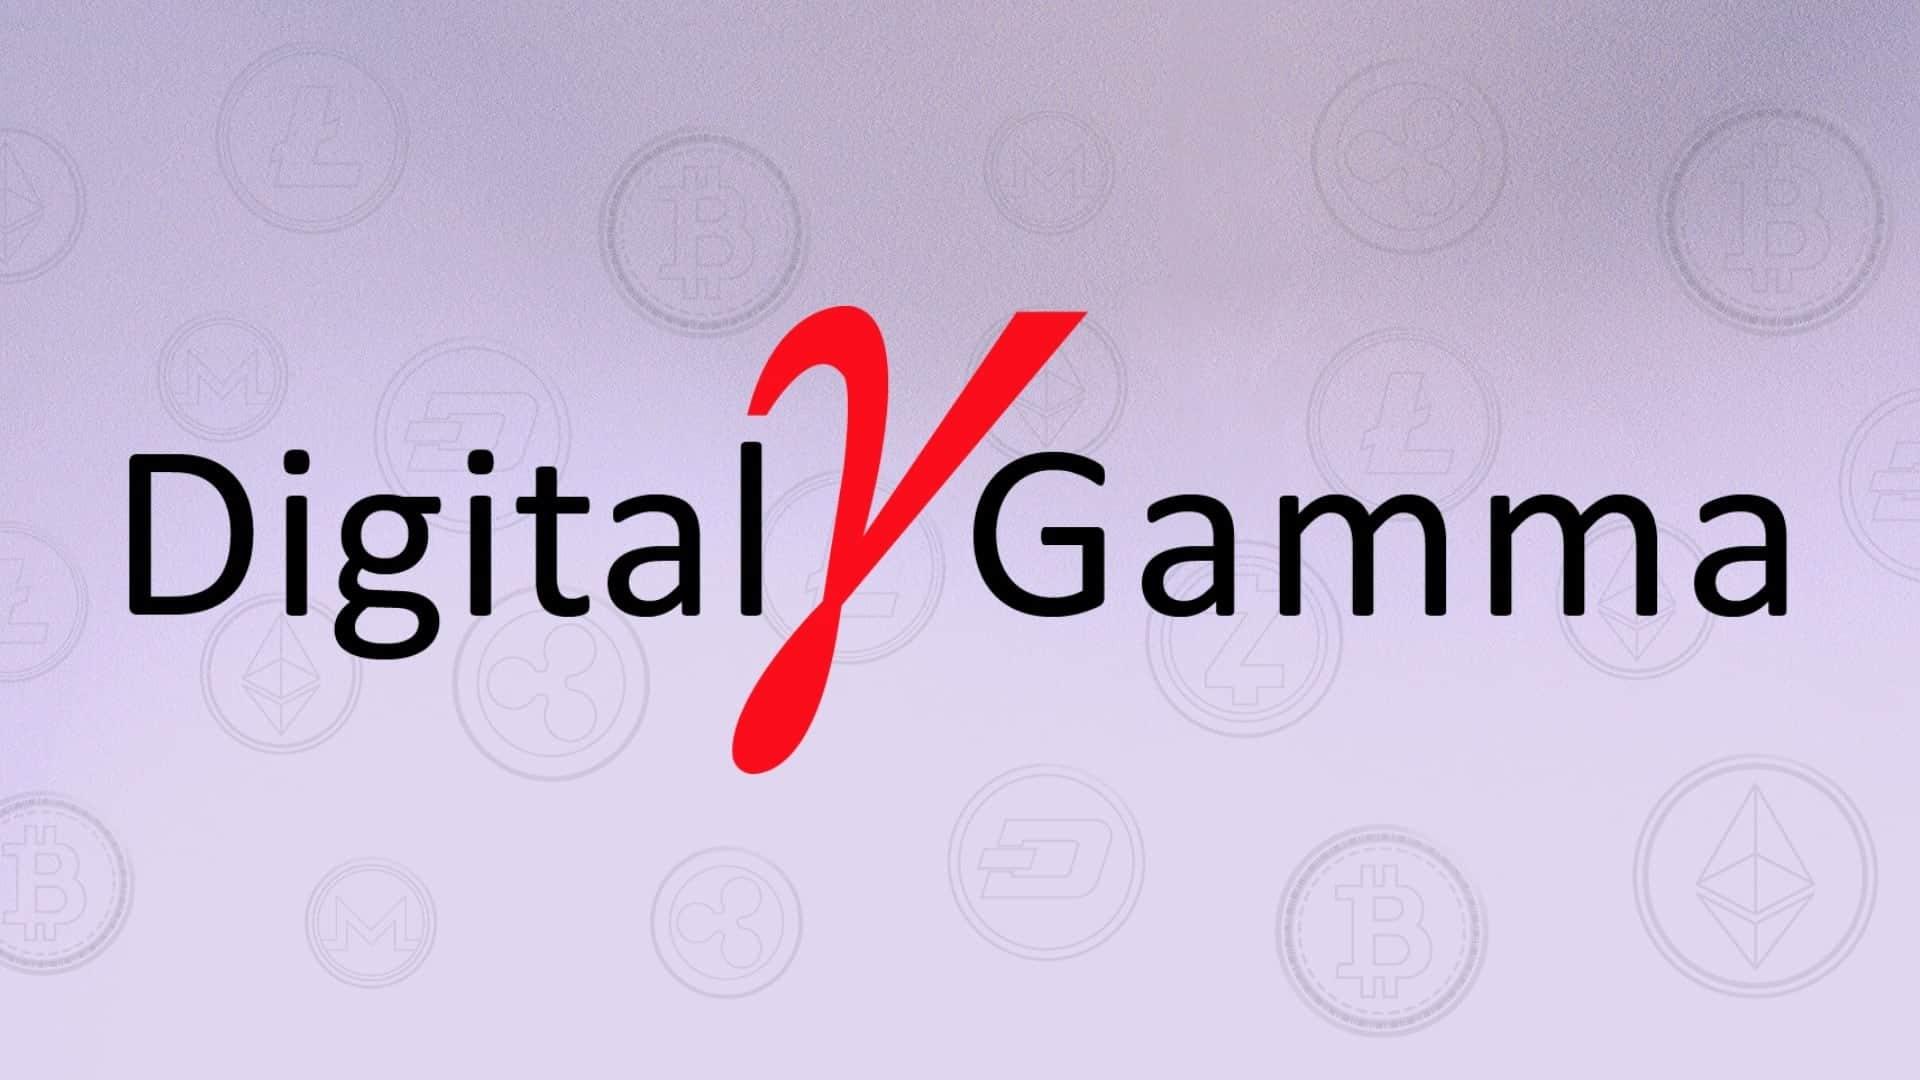 Digital Gamma